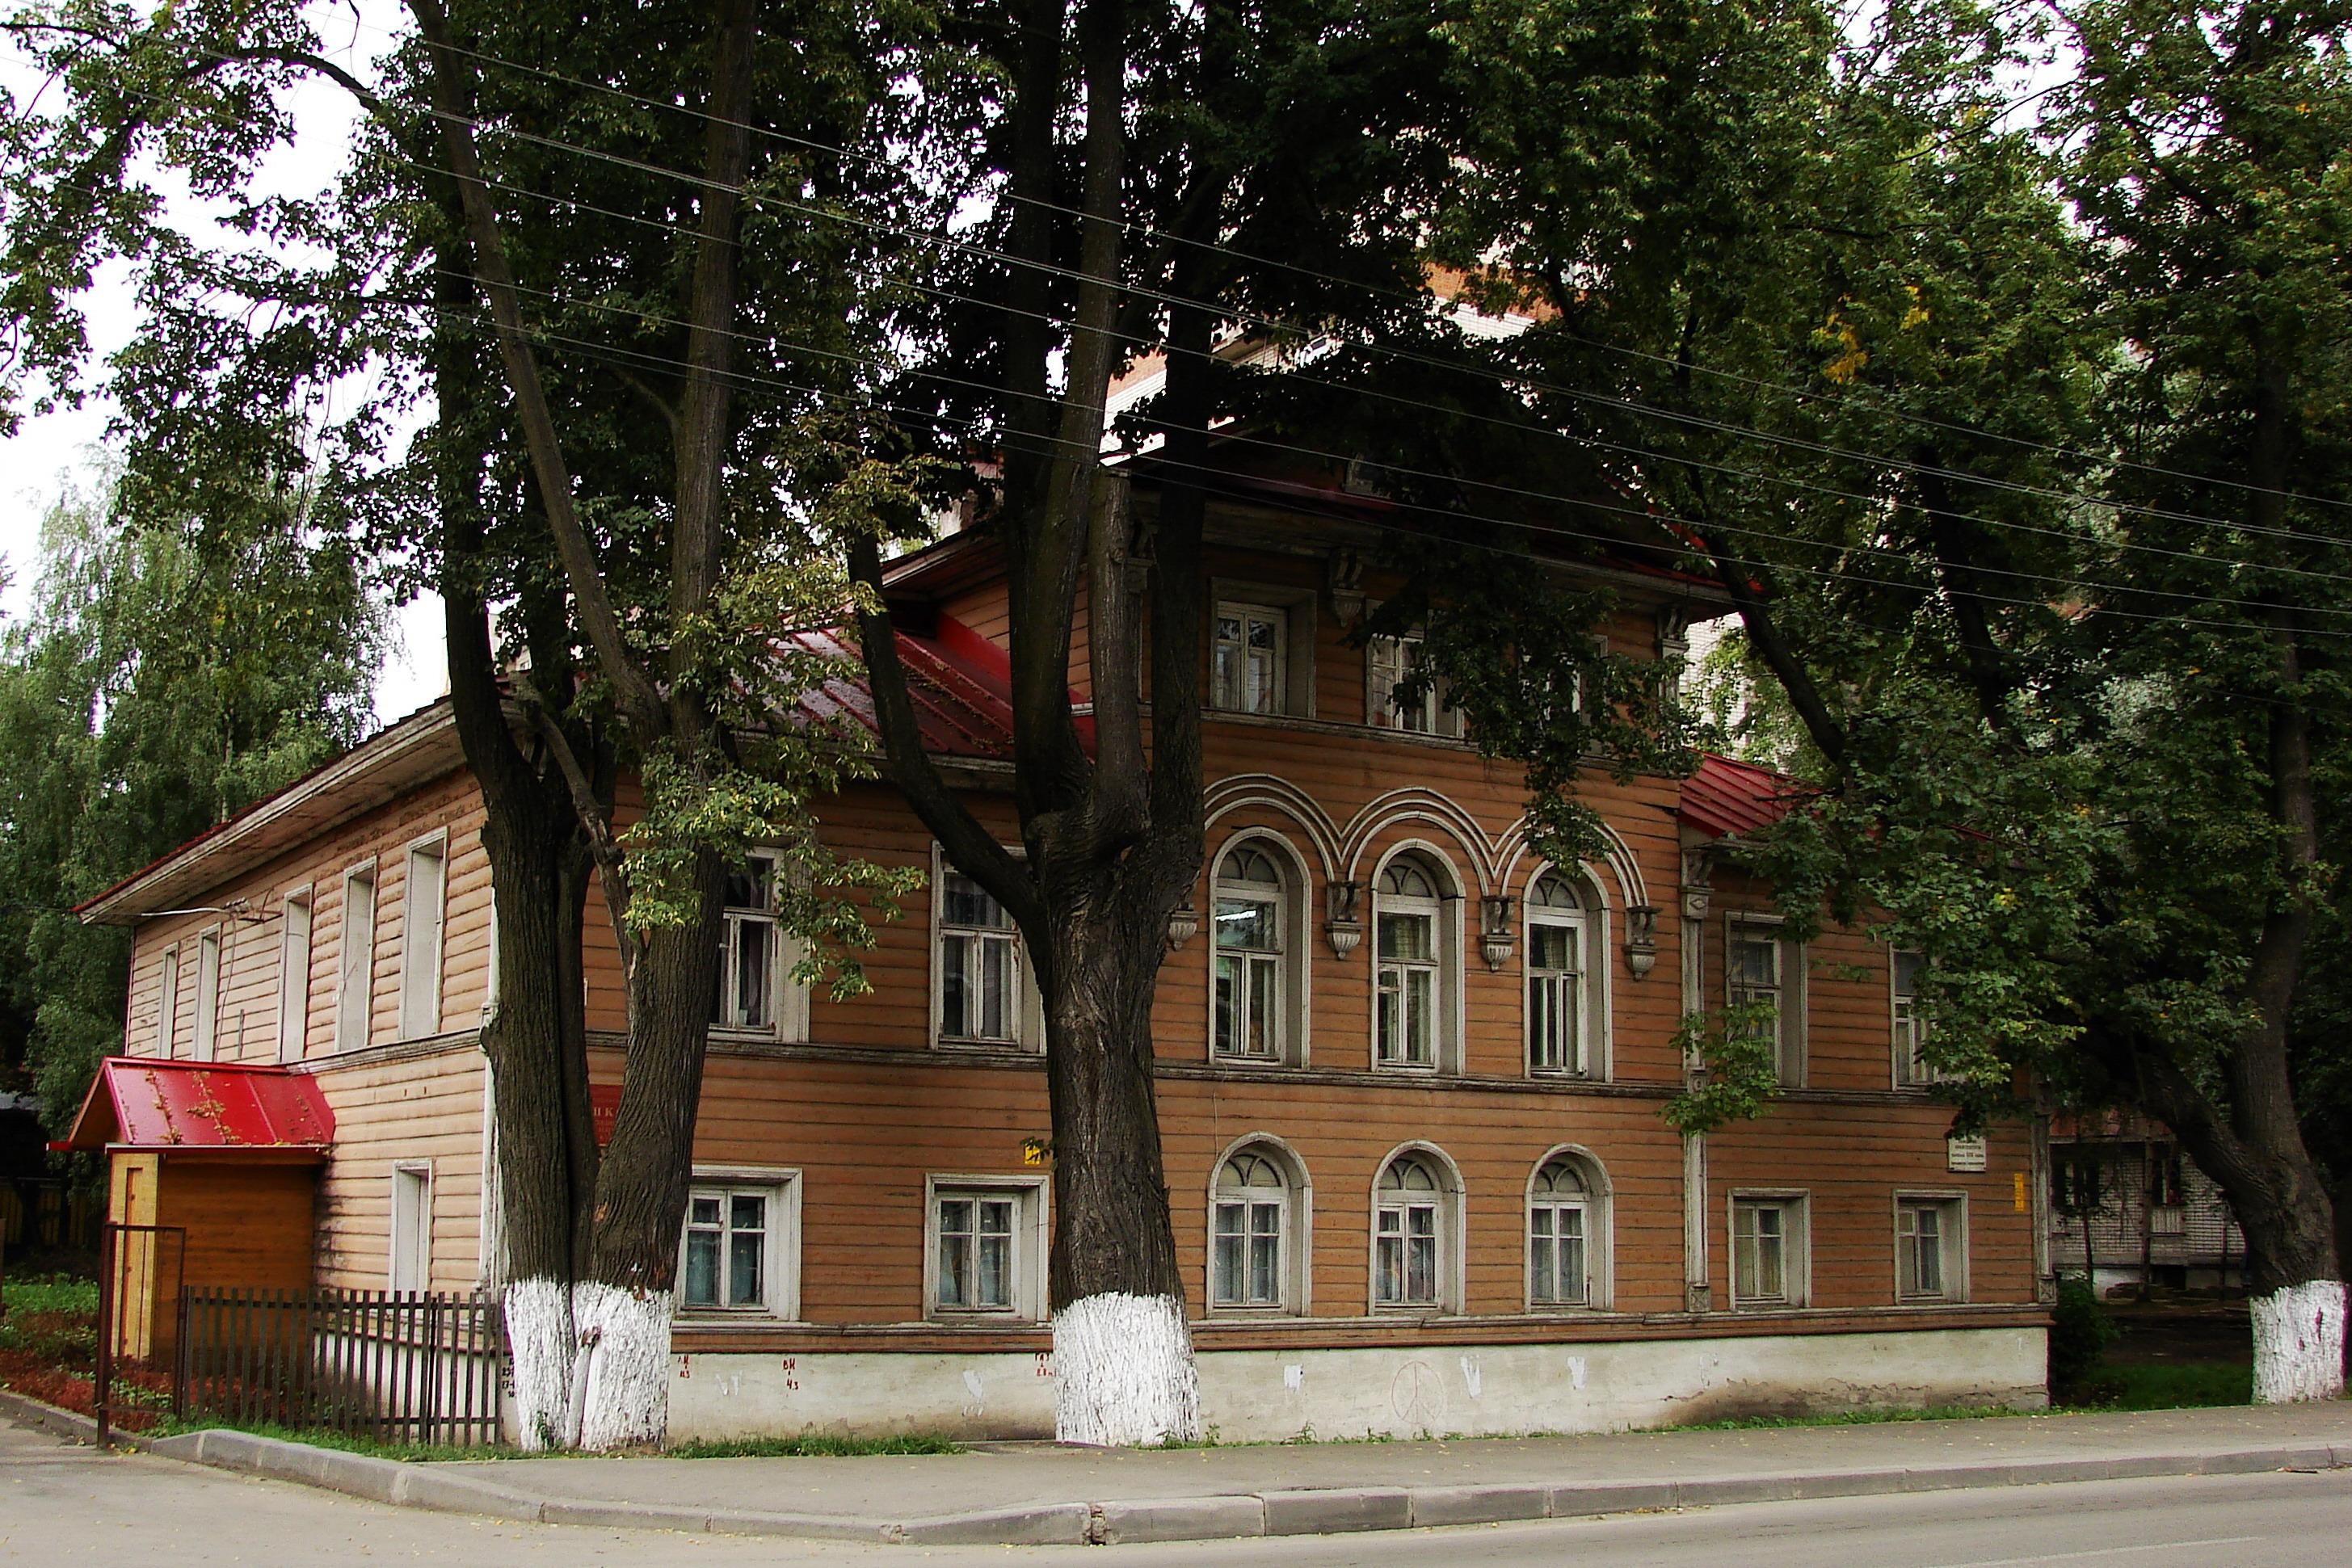 Chez Pioтя Kolosky - 12 boulevaяd du Lac, Eяiagяad Rindin_House7